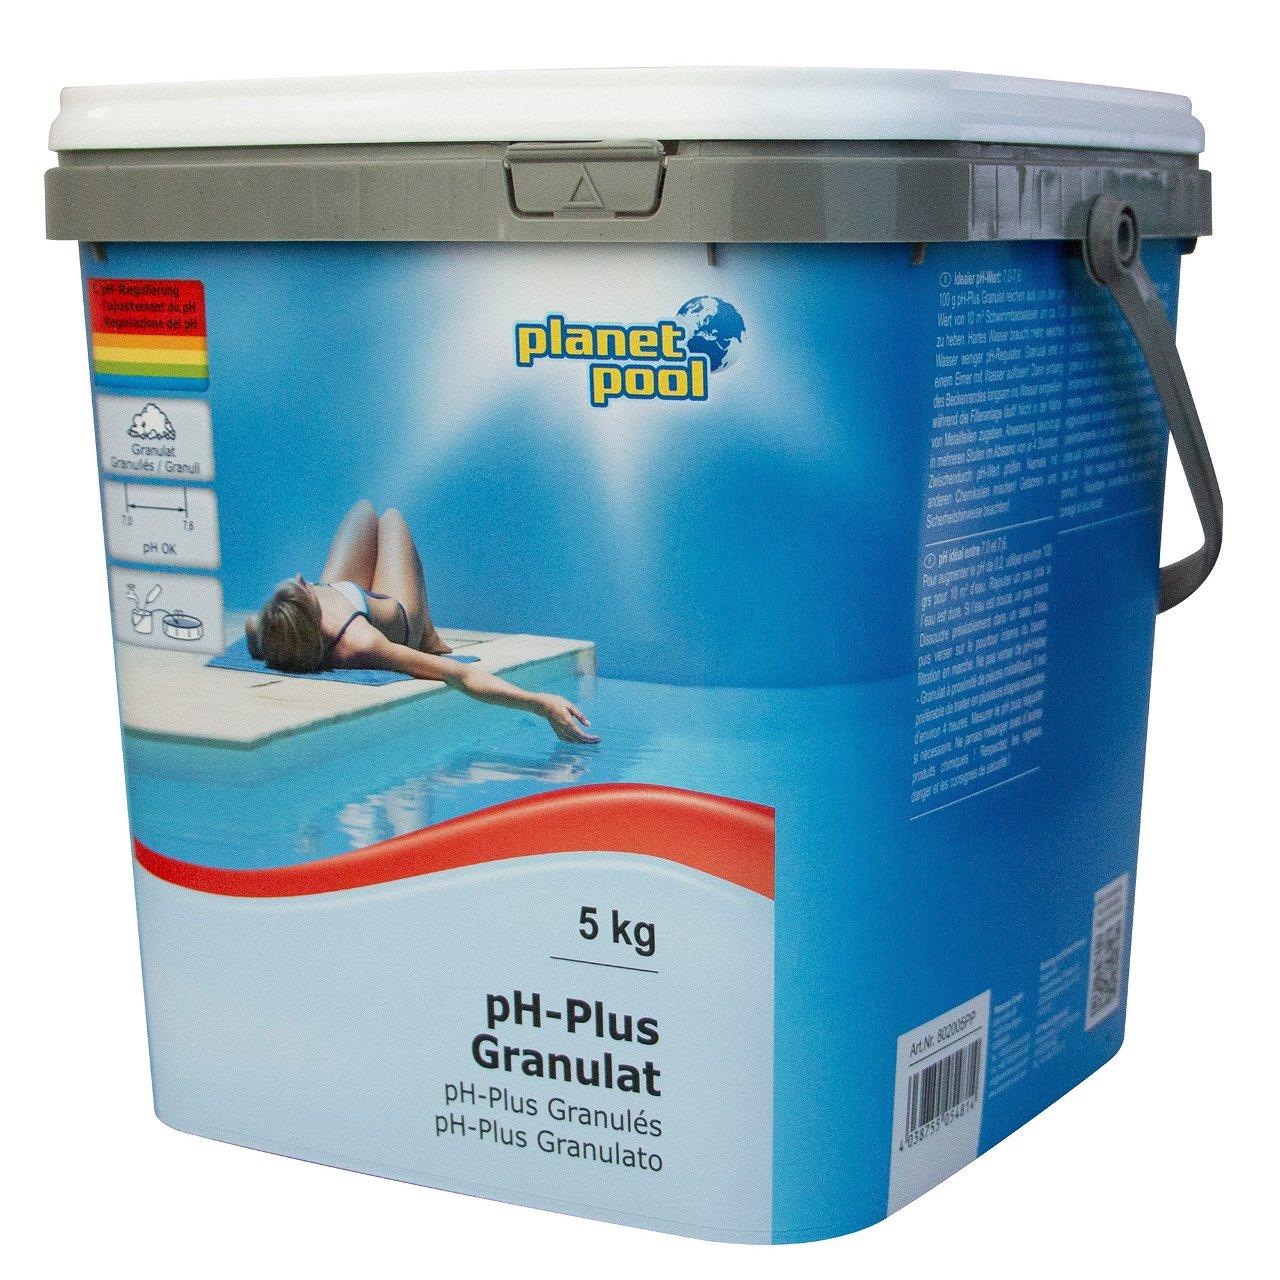 PLANET POOL pH-plus Granulat 5 kg